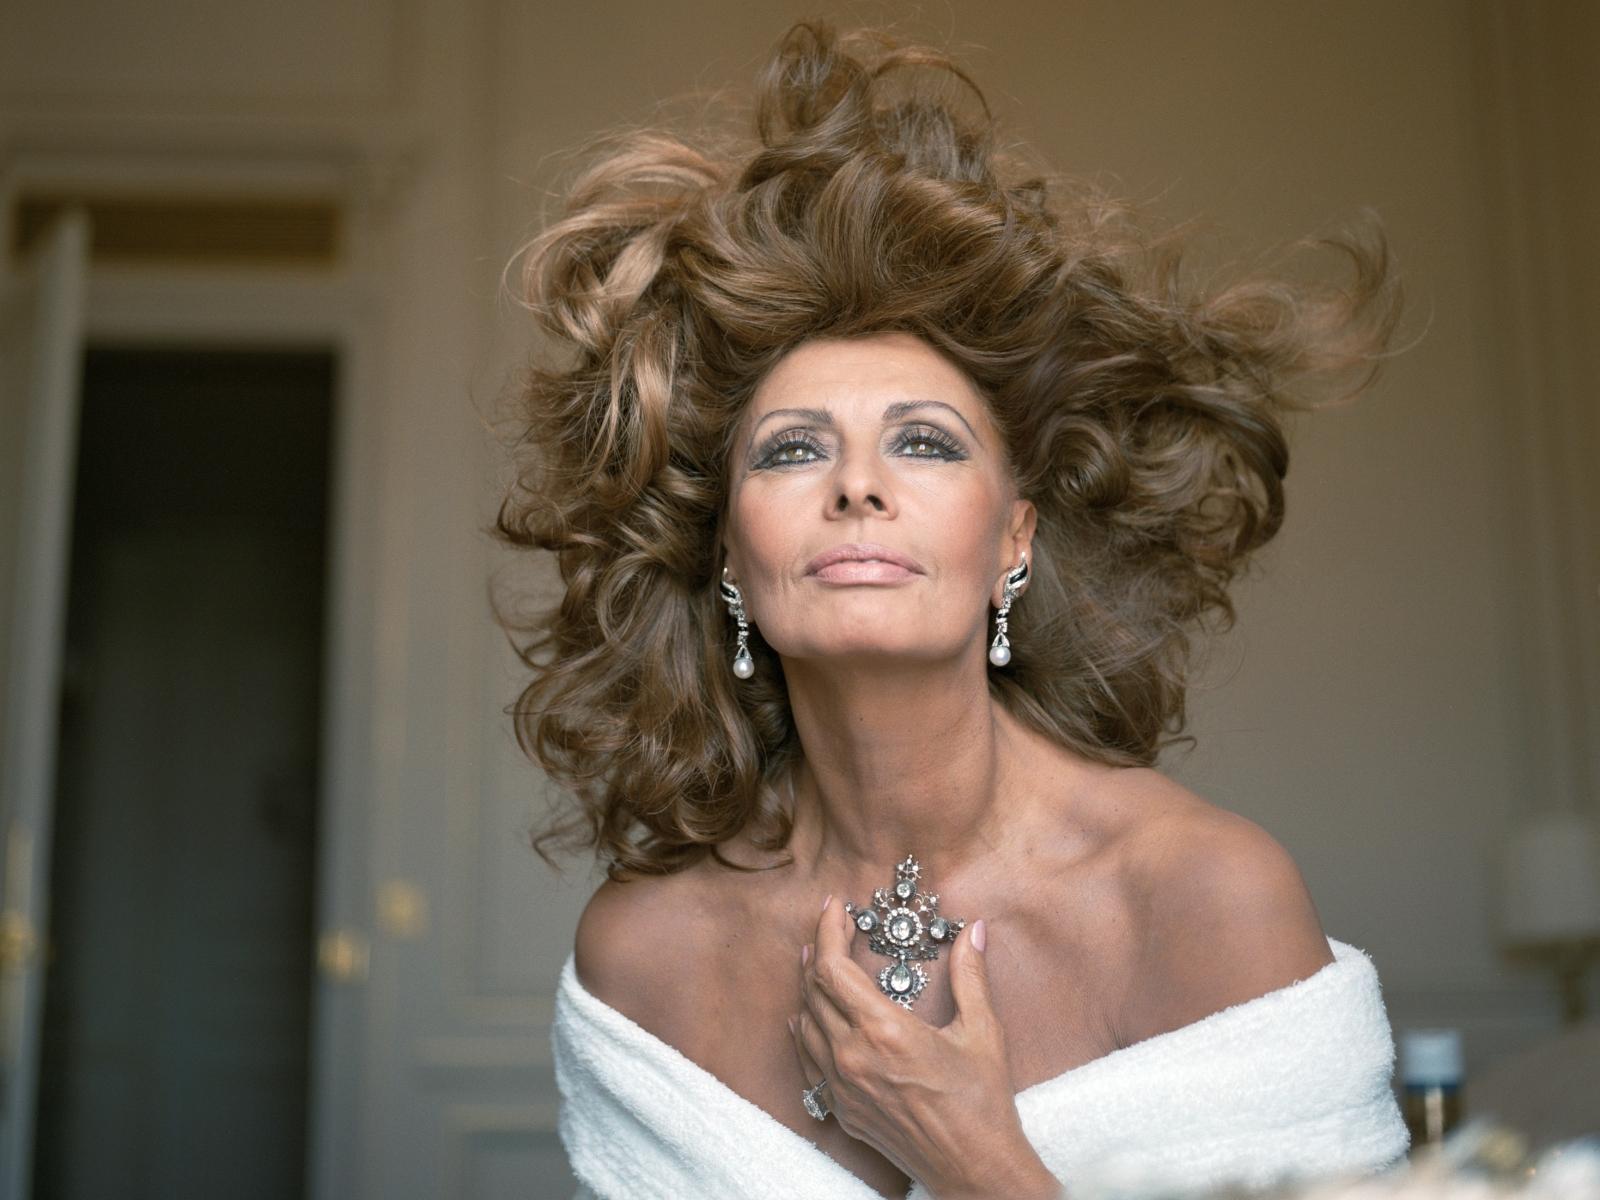 Christopher Uvenio Collezioni: Sophia Loren: 80 Years